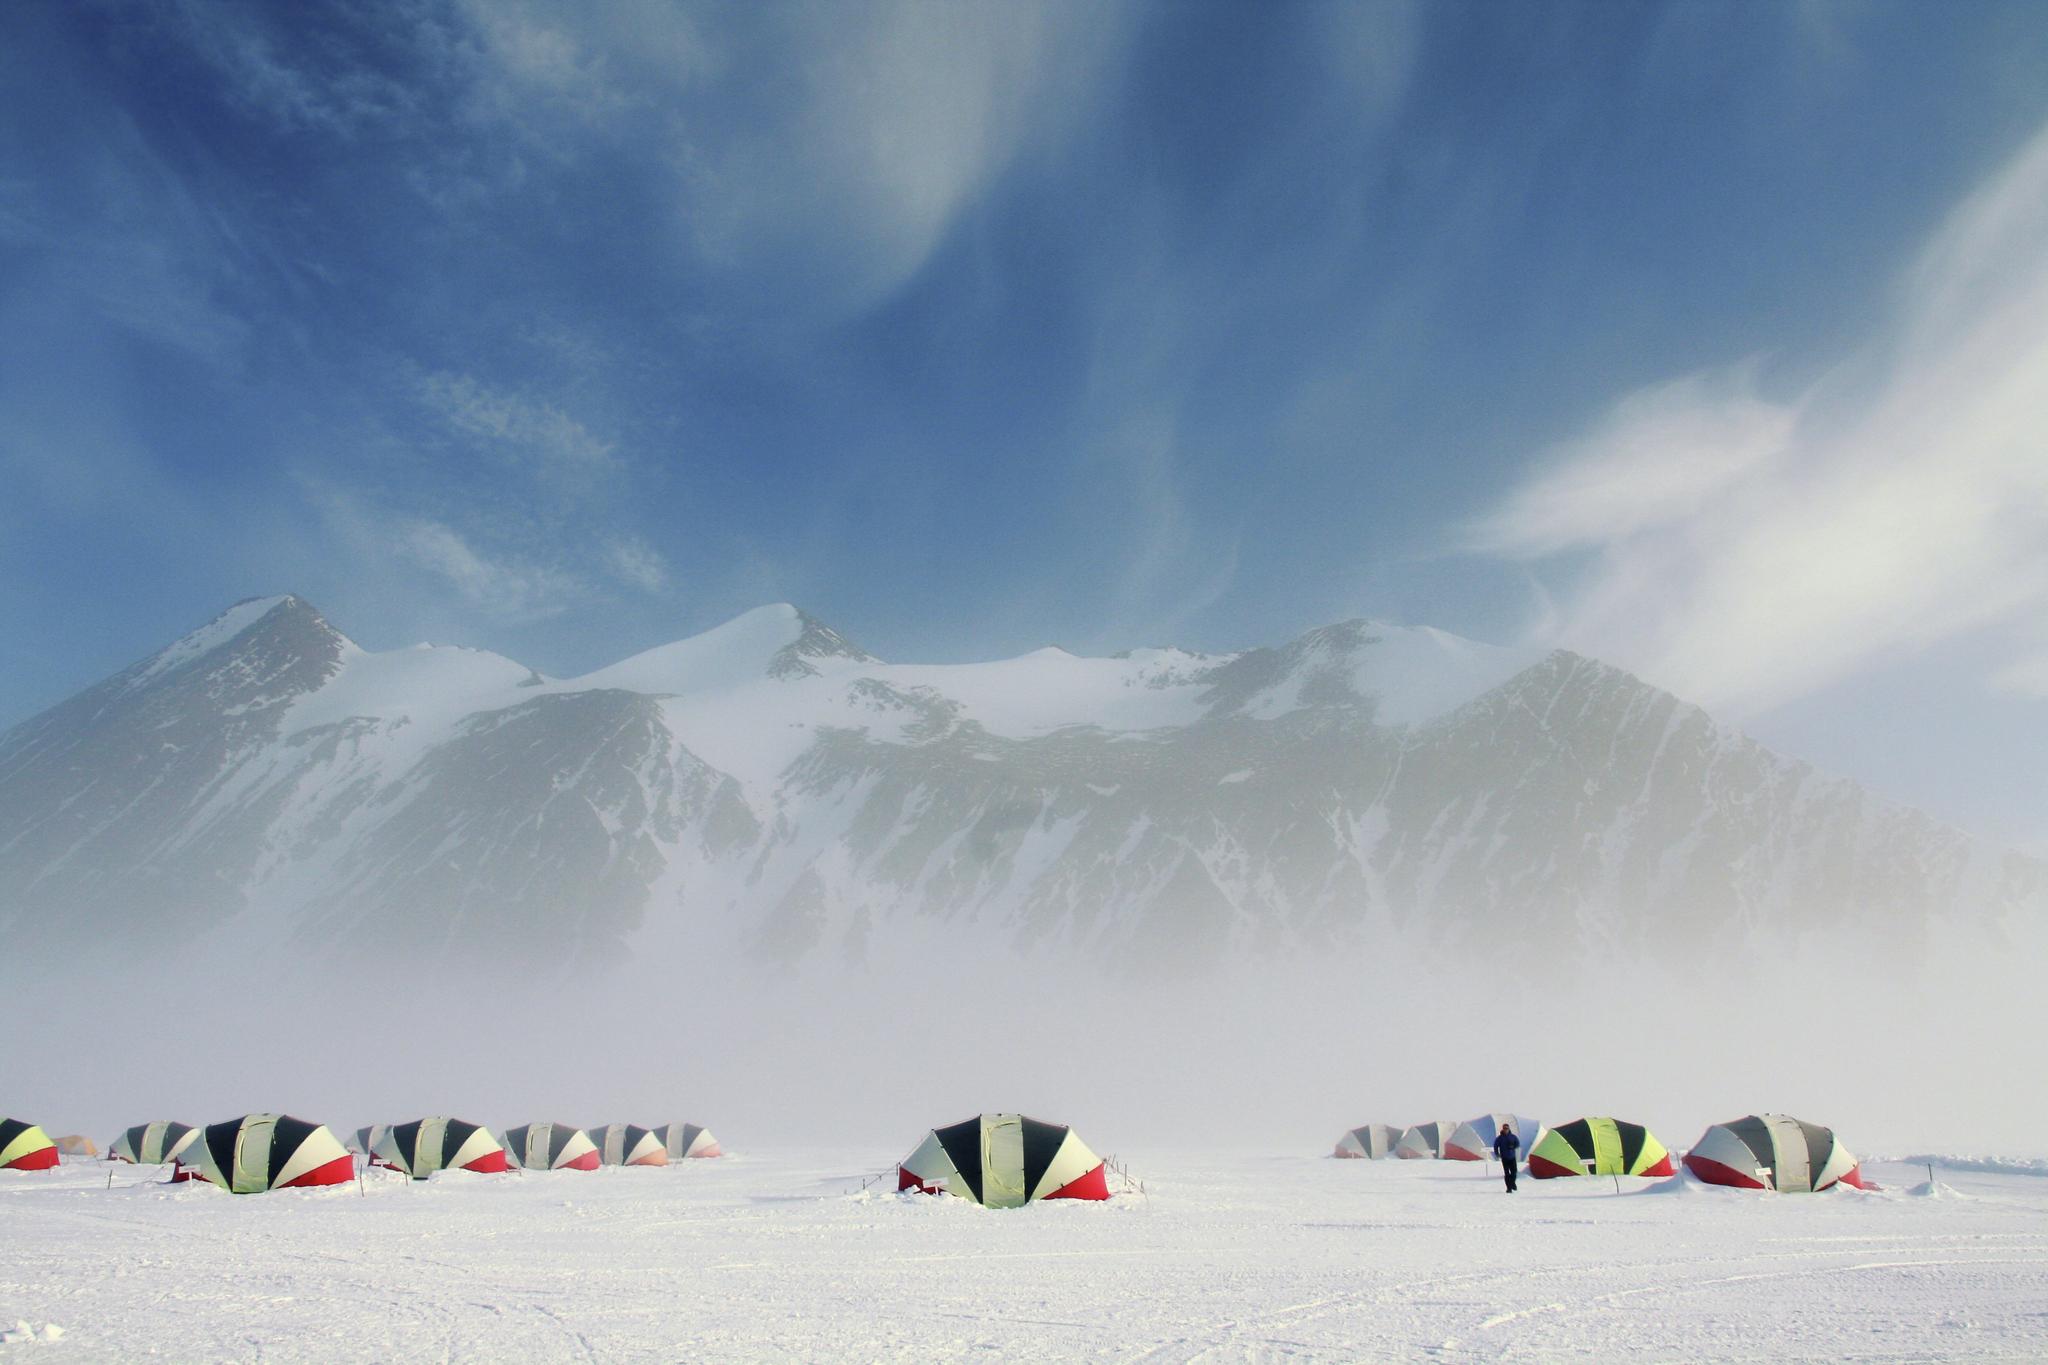 Airbnb per Antartide - Neomag.